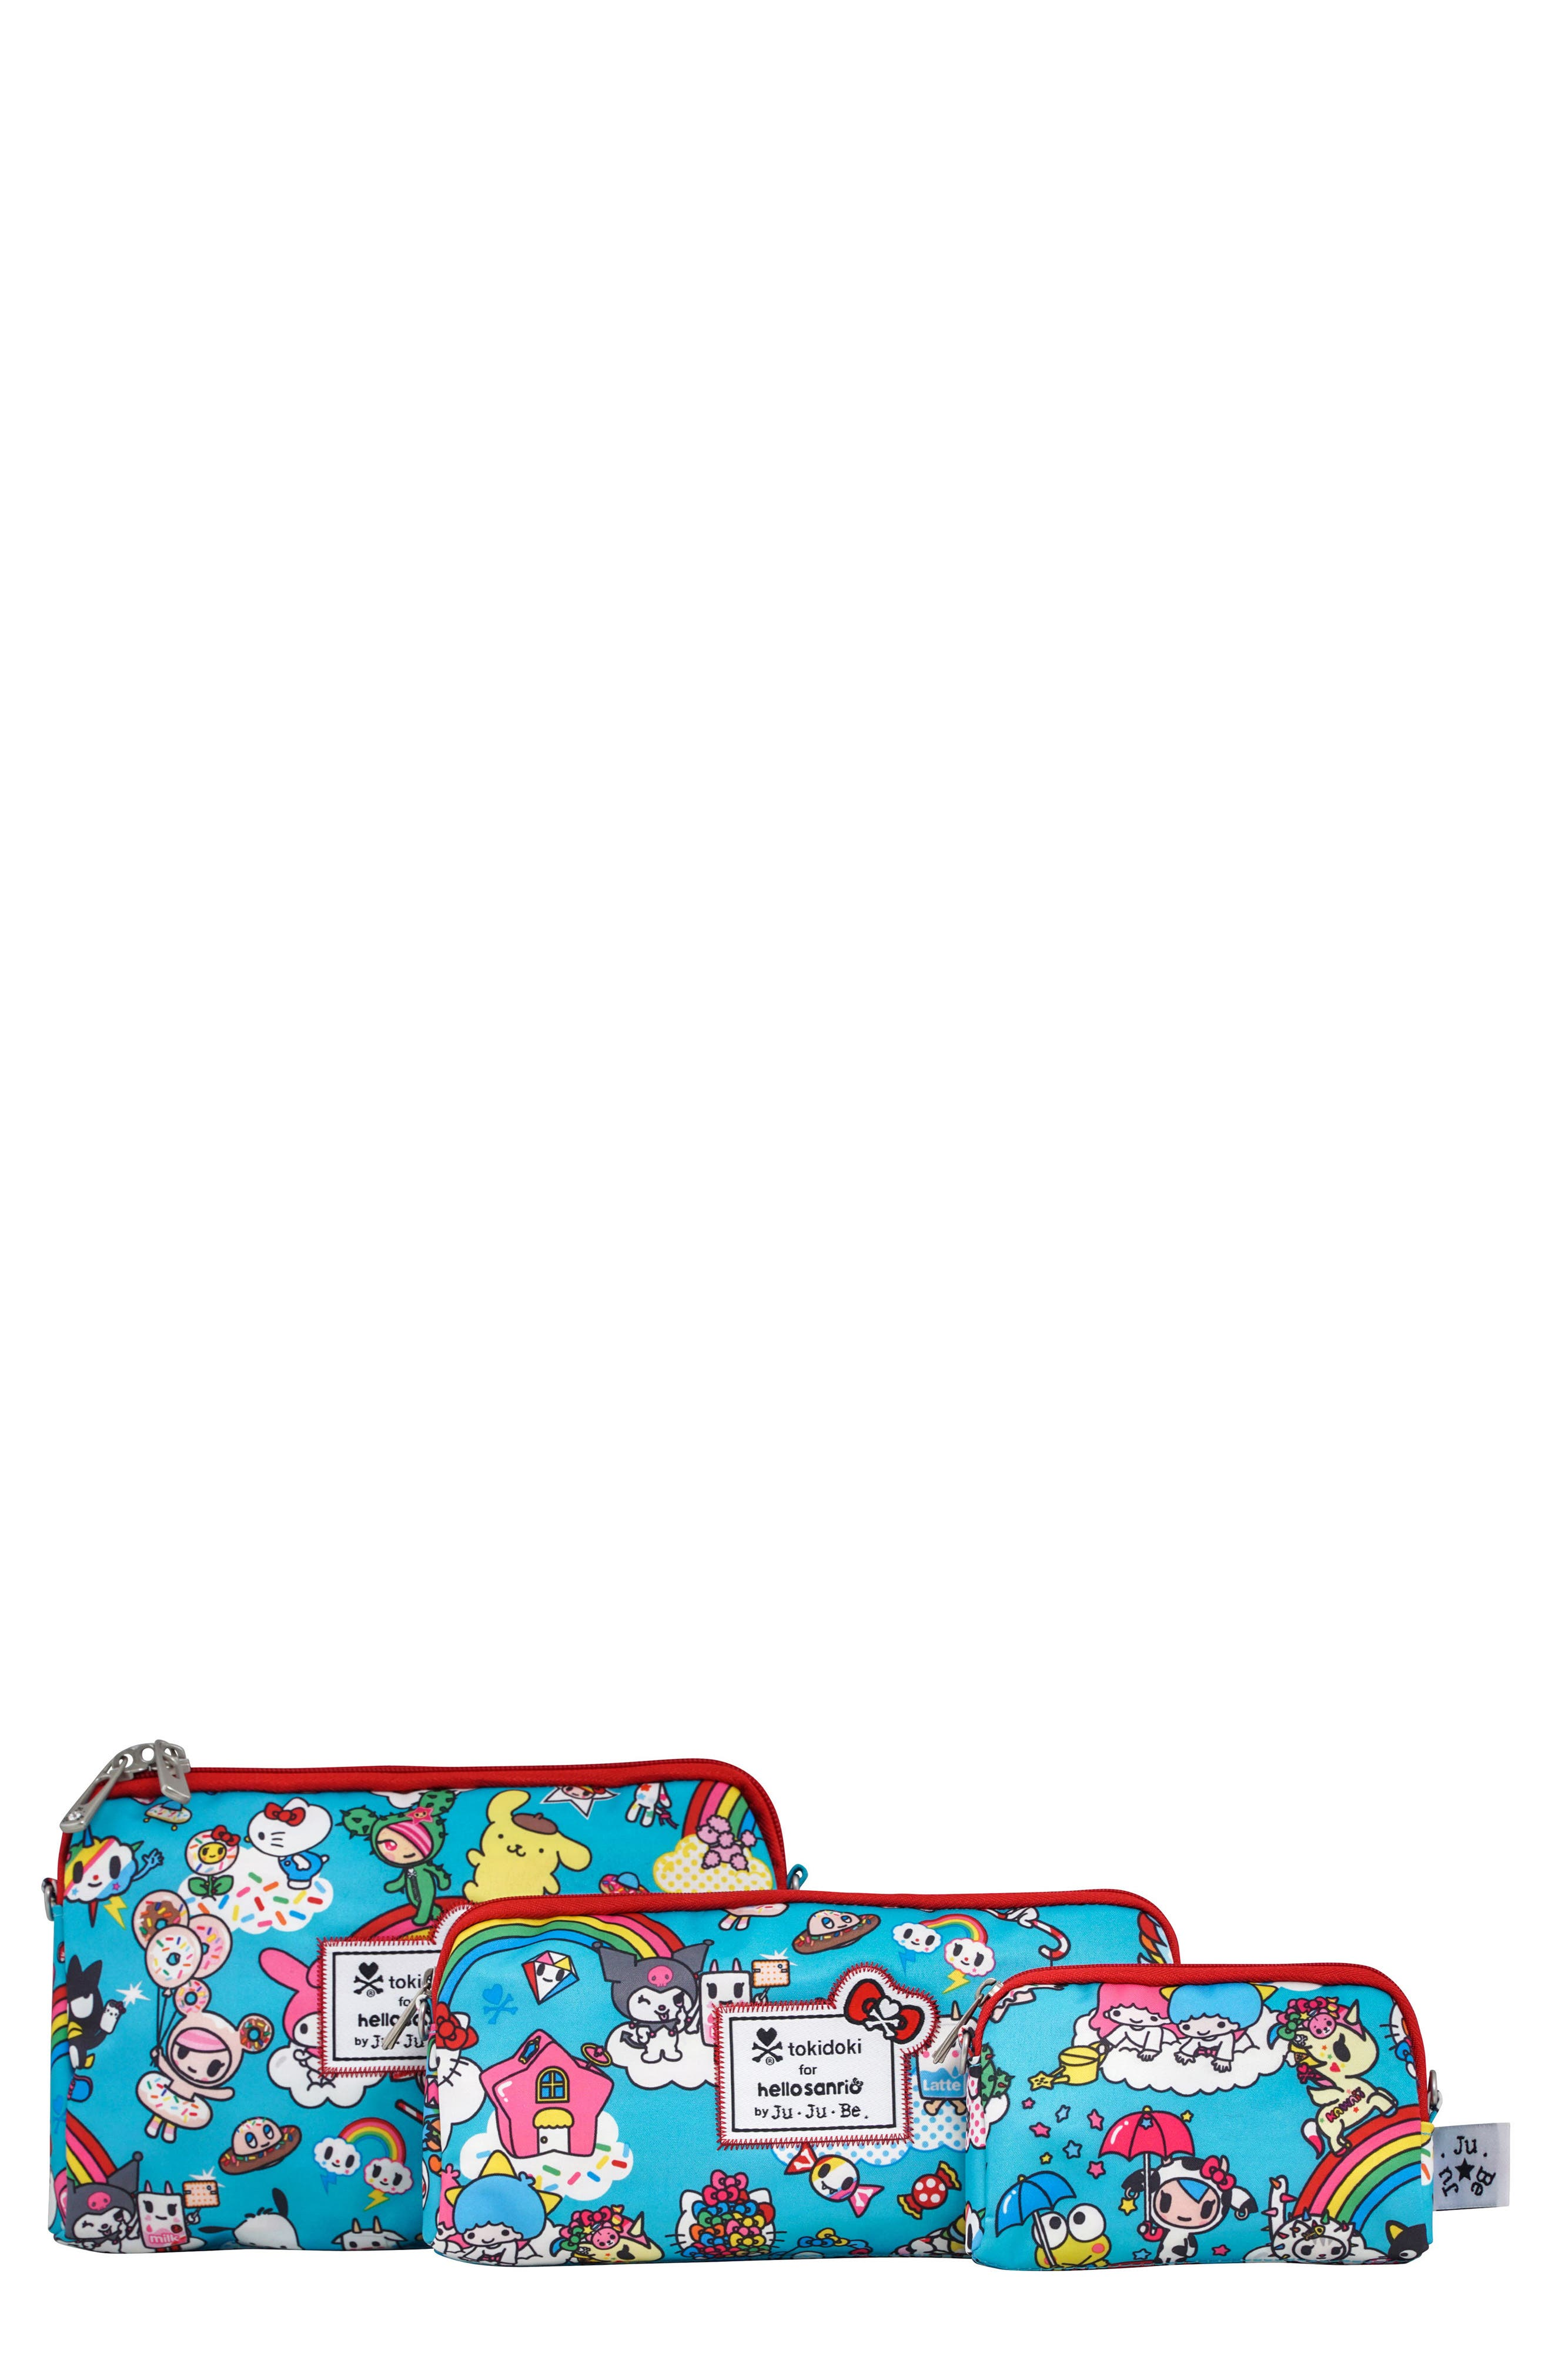 Alternate Image 1 Selected - Ju-Ju-Be x tokidoki for Hello Sanrio Rainbow Dreams Be Organized Set of 3 Top Zip Cases